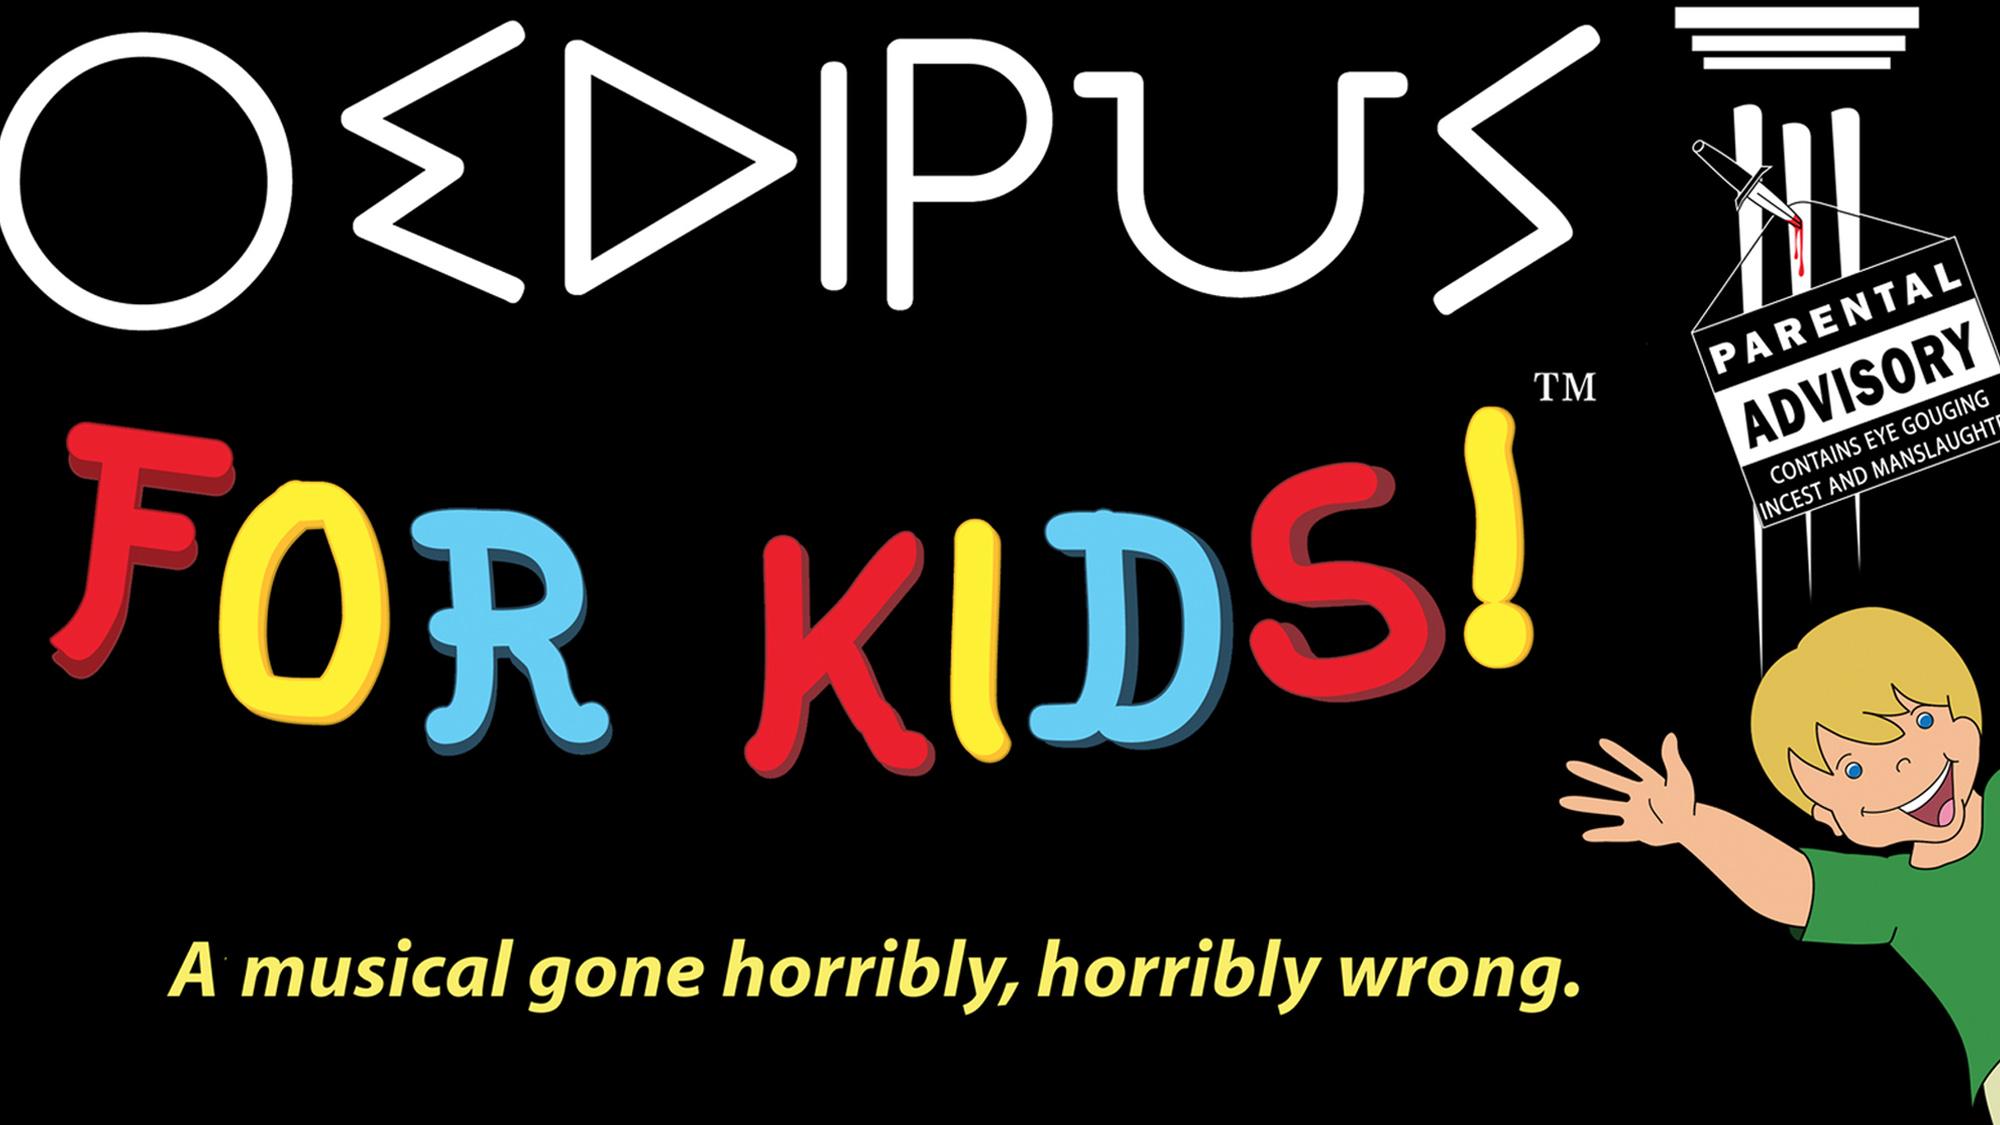 OedipusKids Large Image.jpg